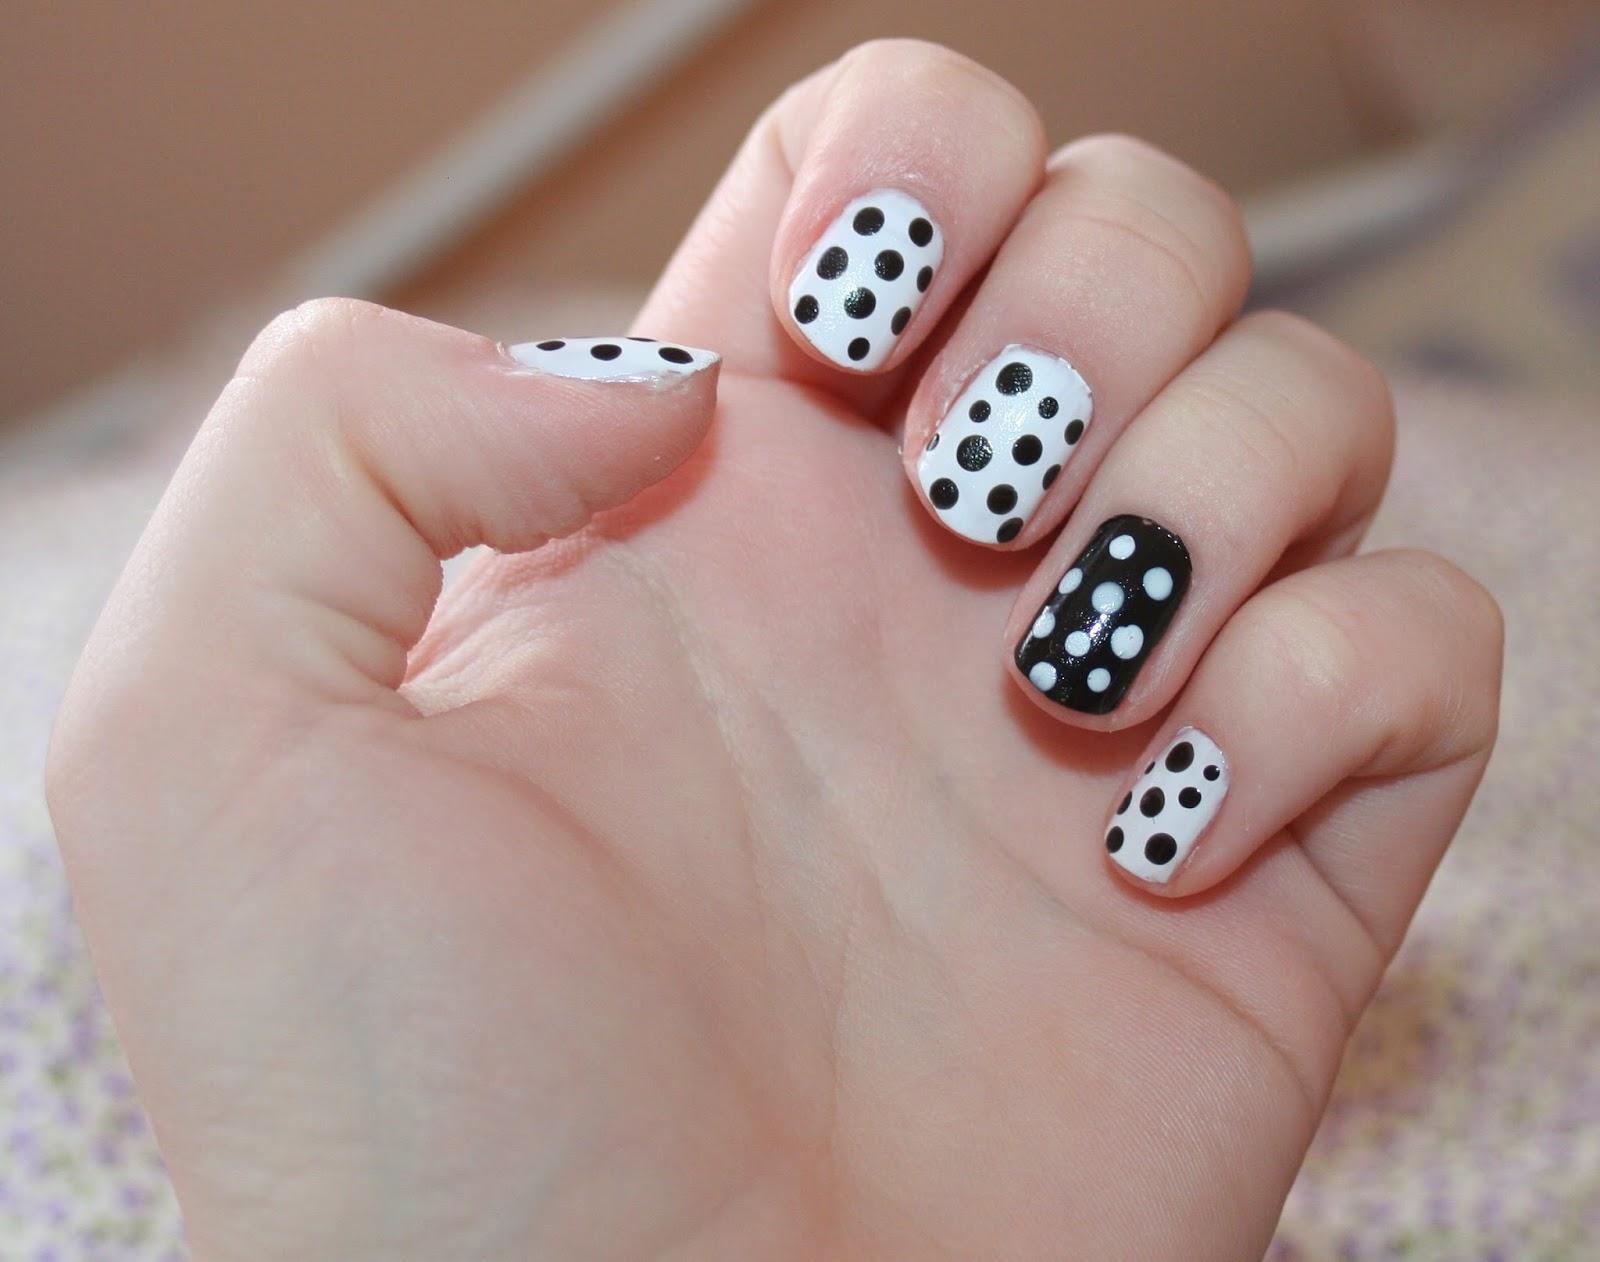 Flowertopsfi: Nail Art - Polka Dots